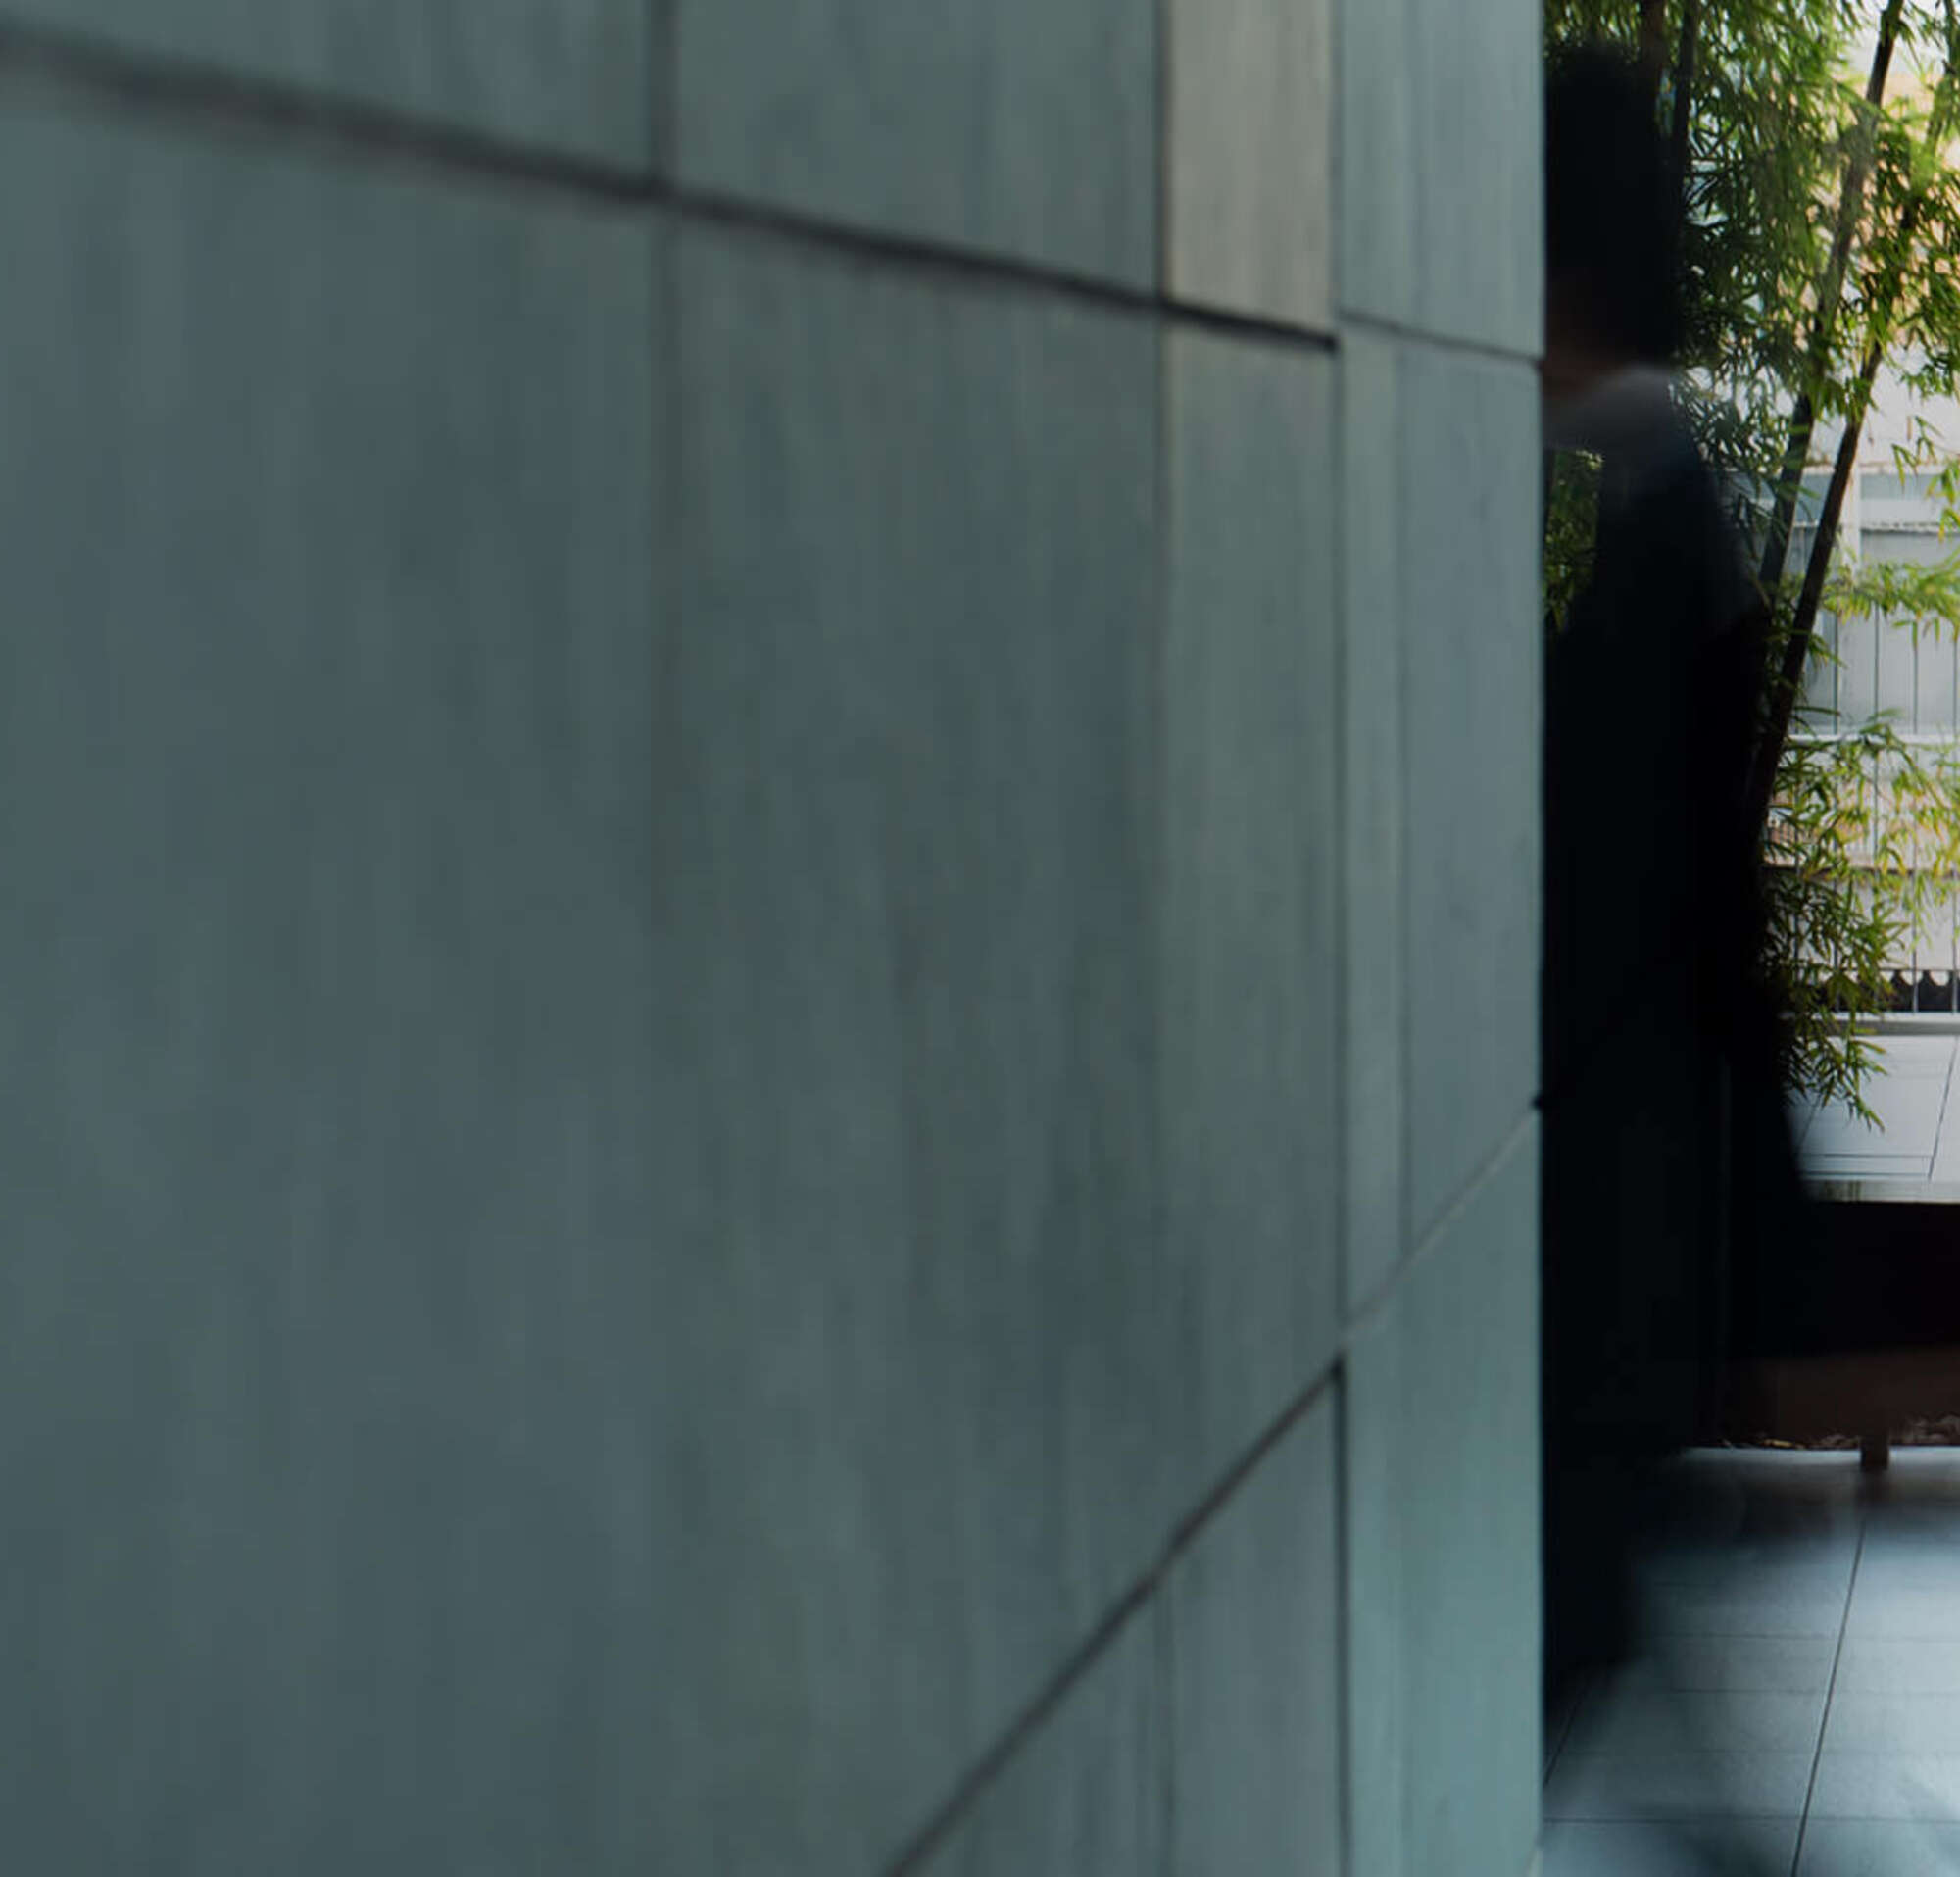 A long exposure image of people walking through a modern atrium.